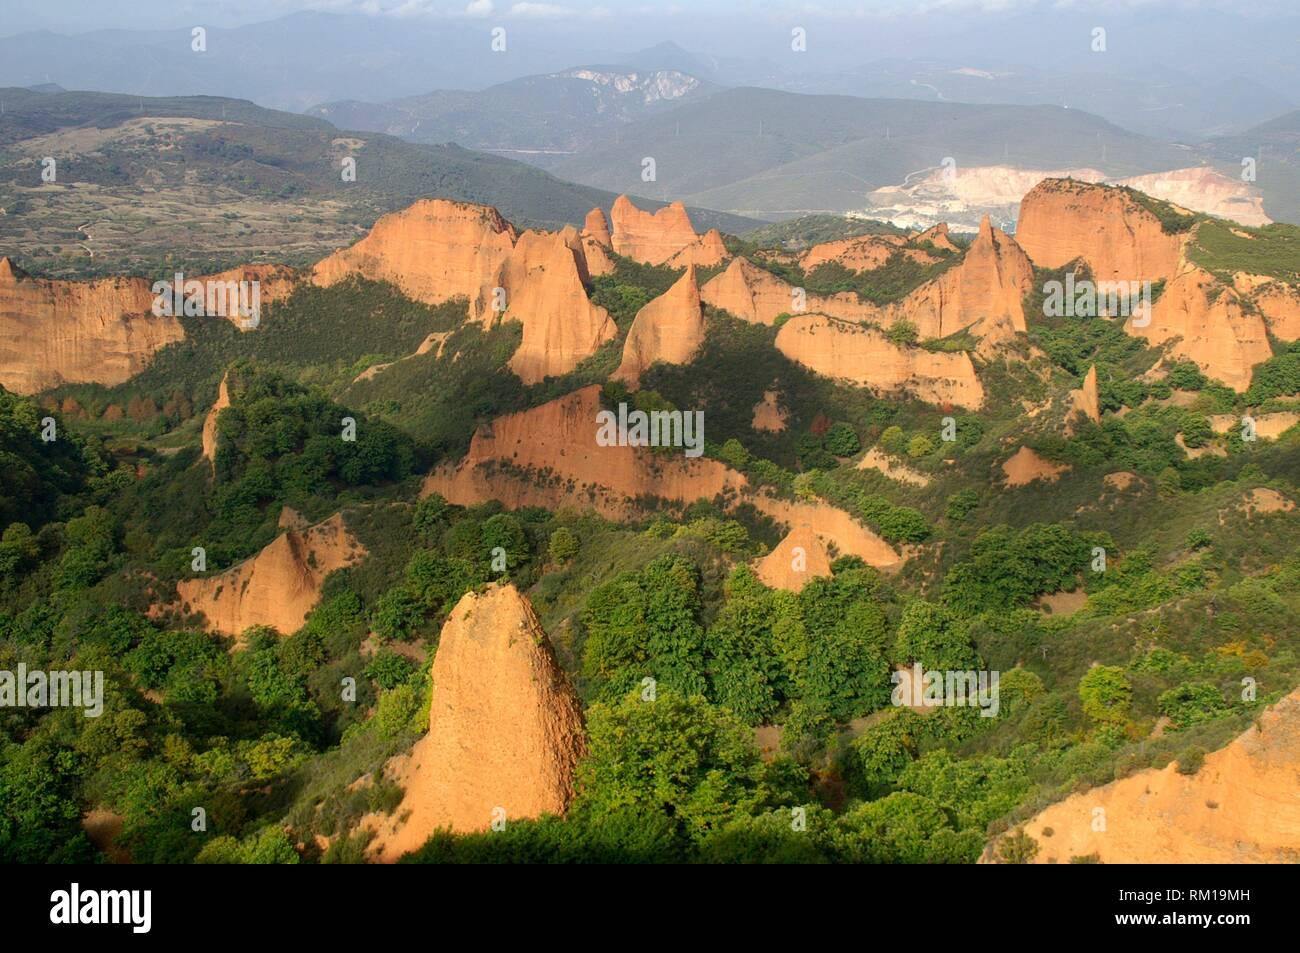 District of El Bierzo (Spain). Las Médulas landscape environment of the old Roman gold mining. - Stock Image